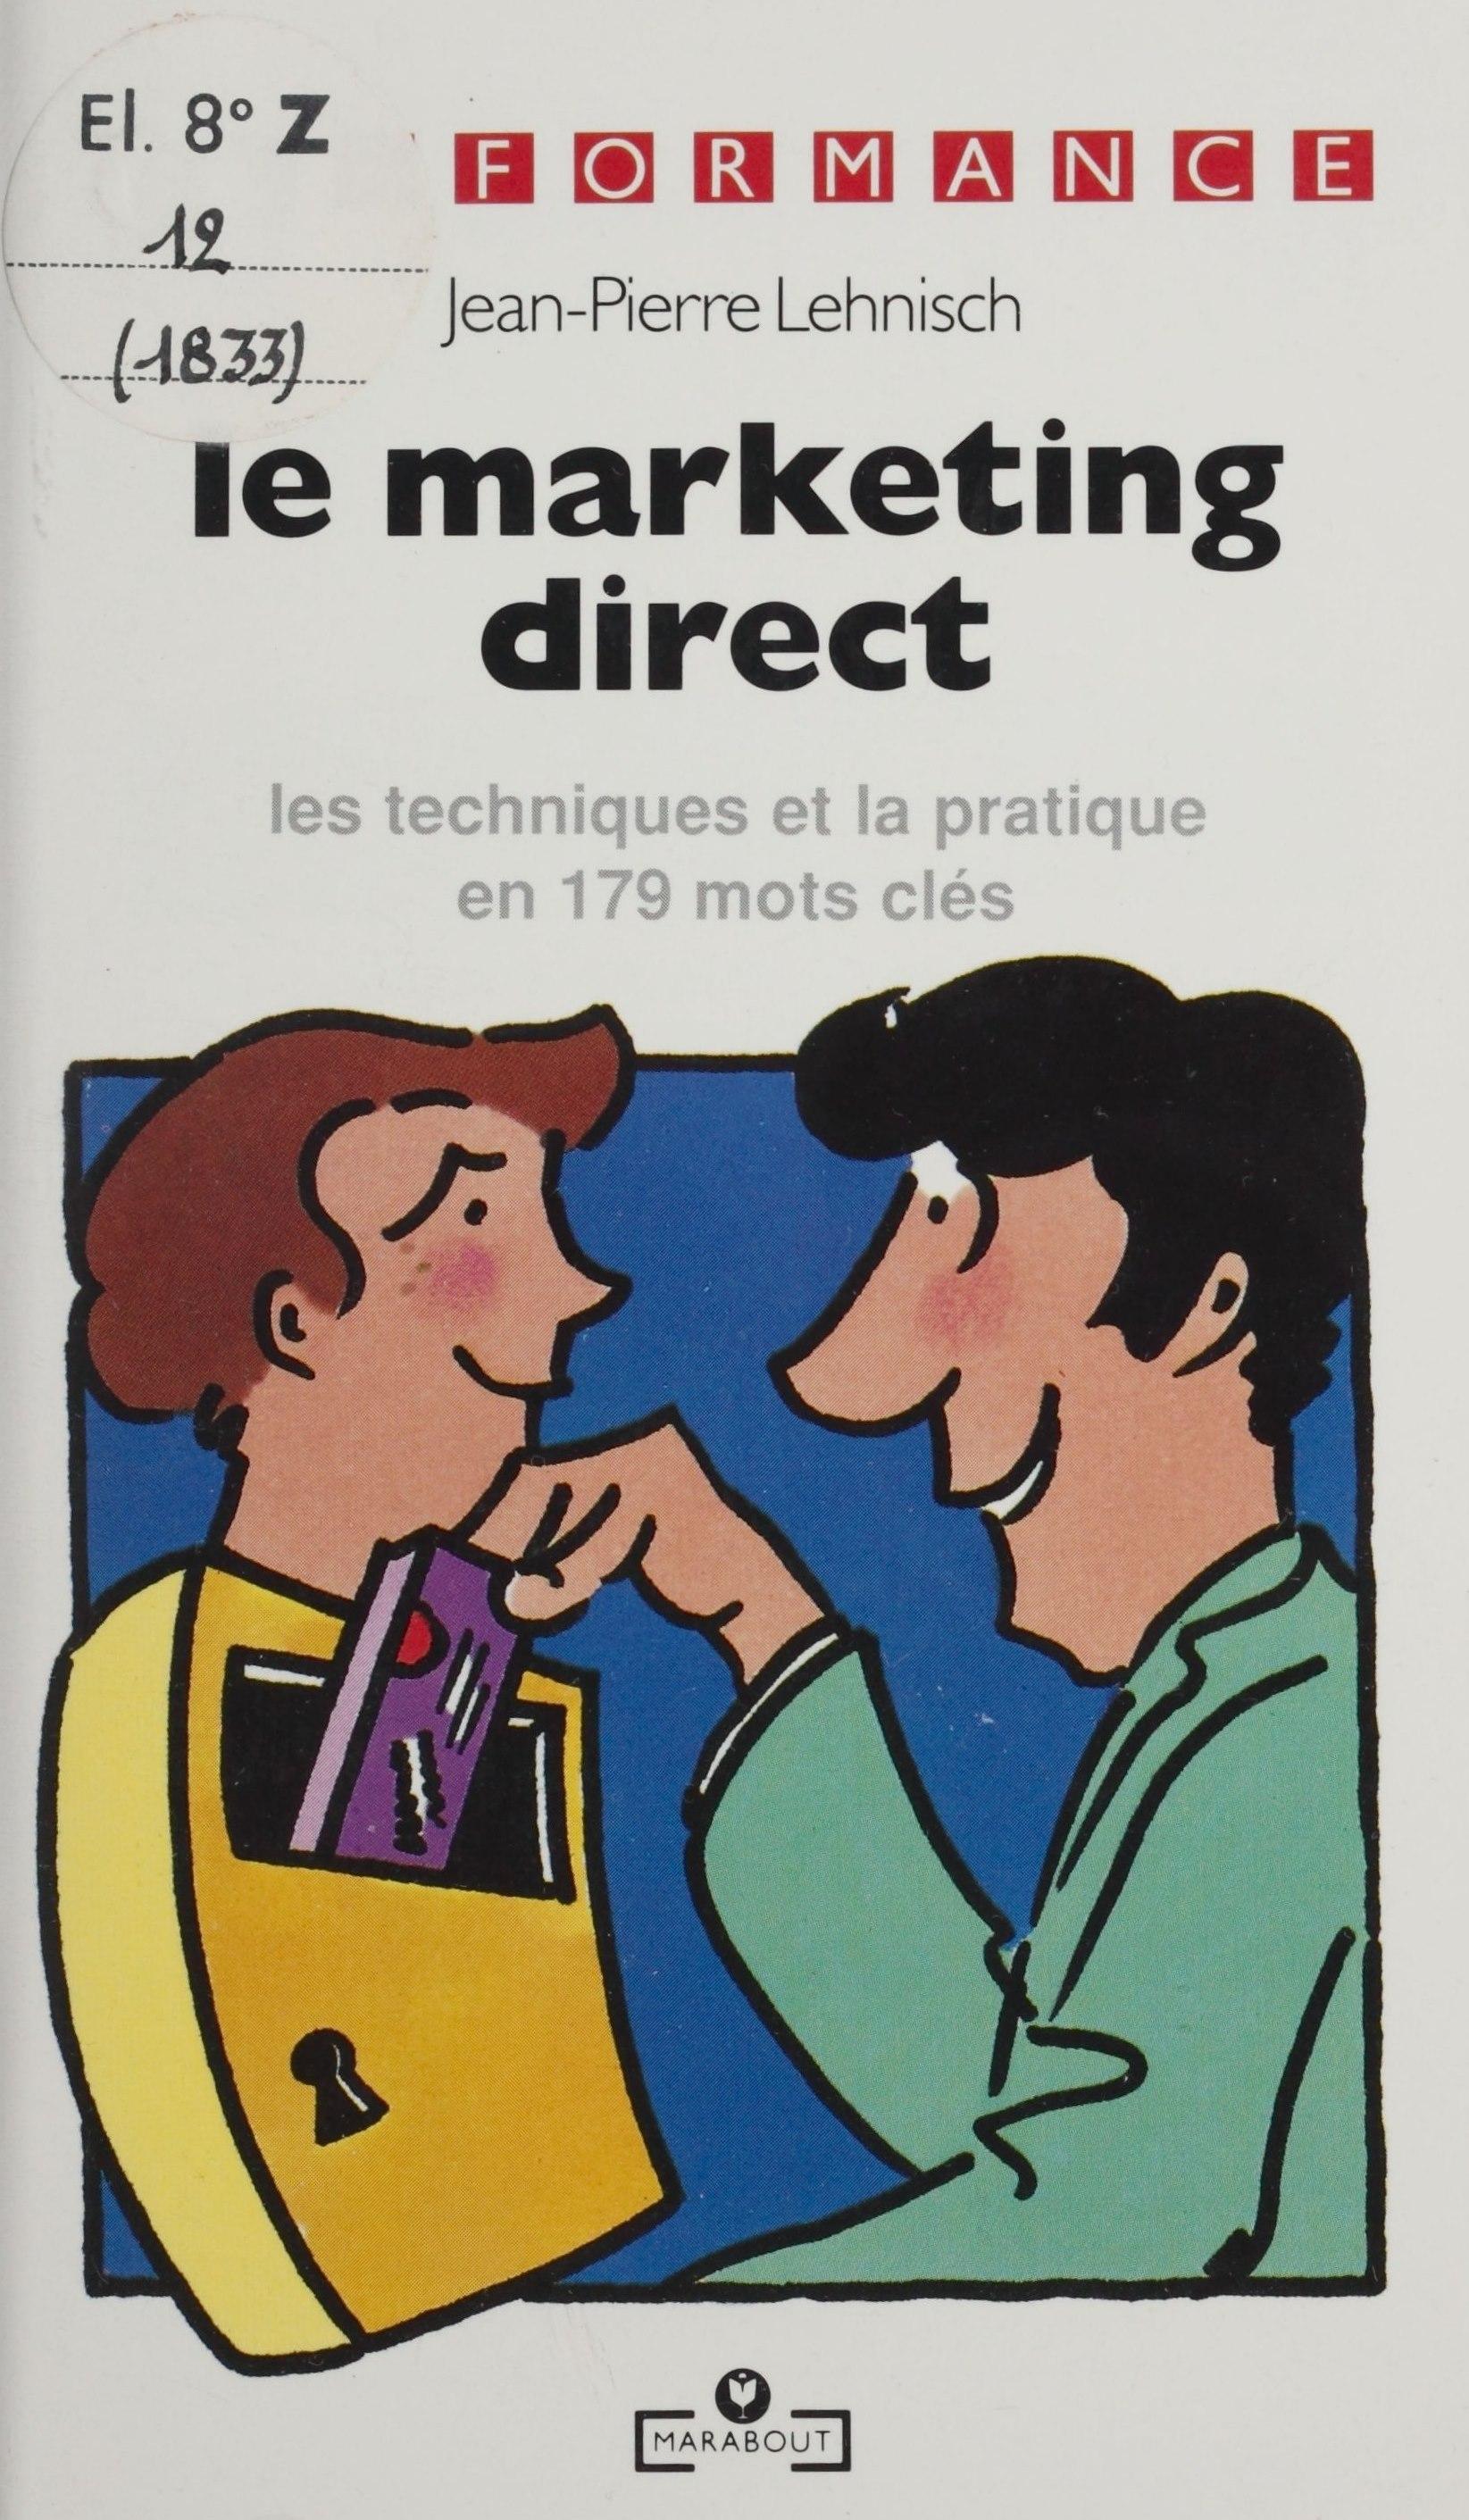 Le Marketing direct